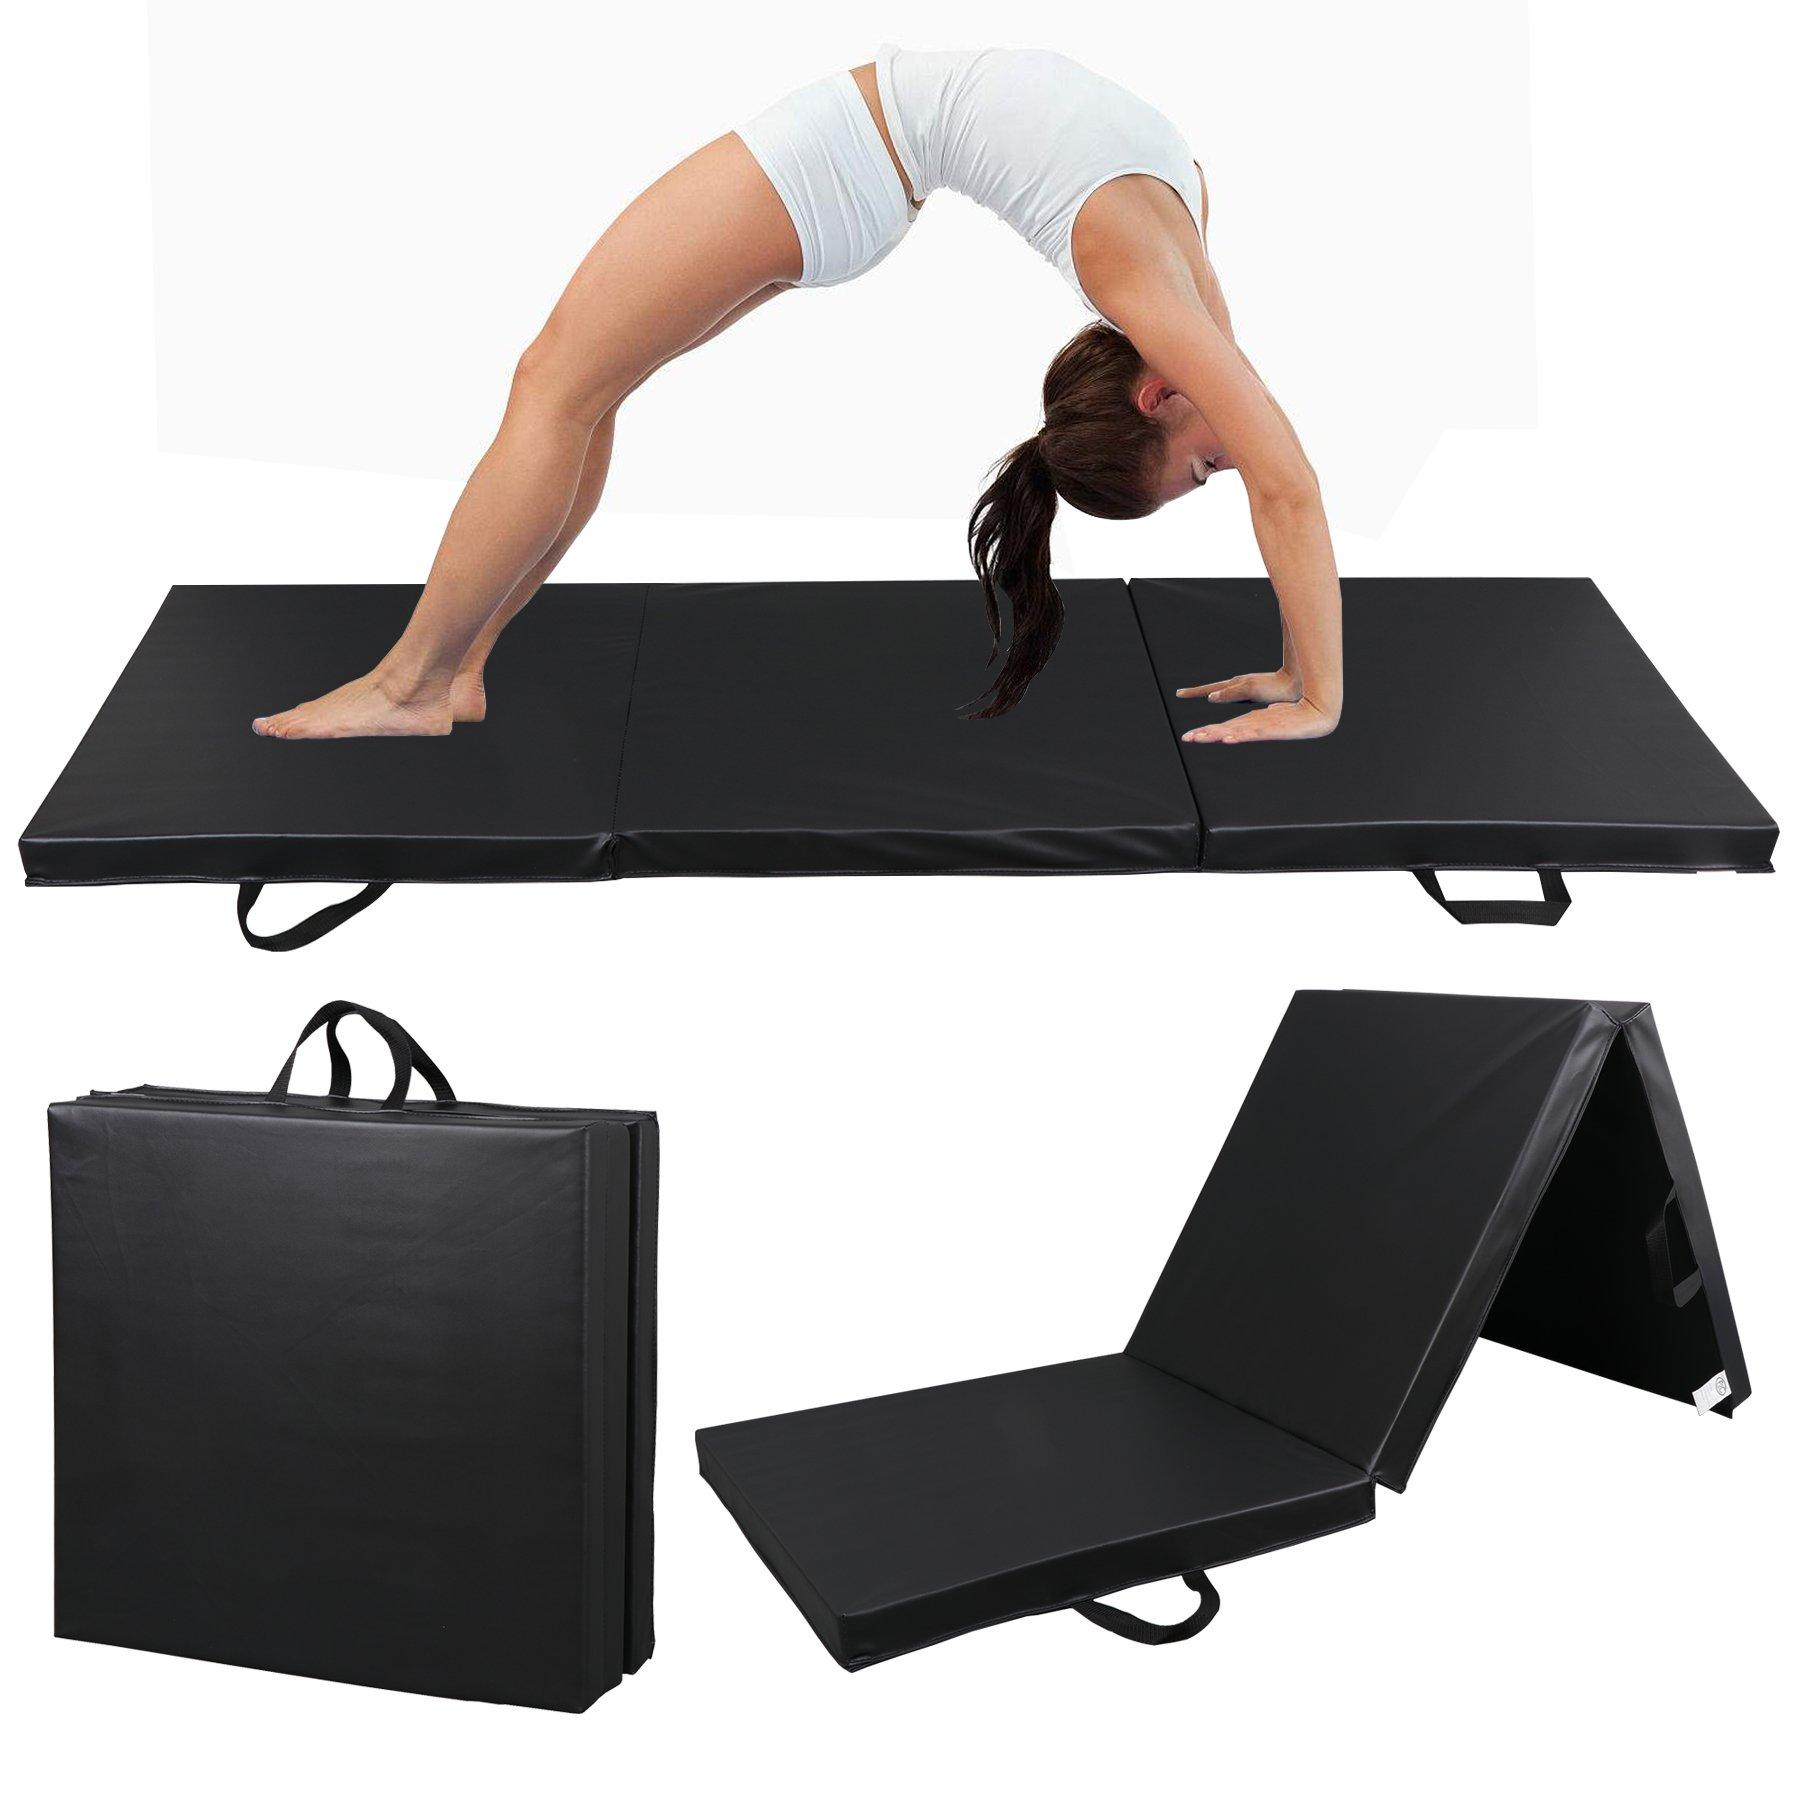 Zeny Tri Fold 6 X2 X2 Folding Exercise Gymnastics Gym